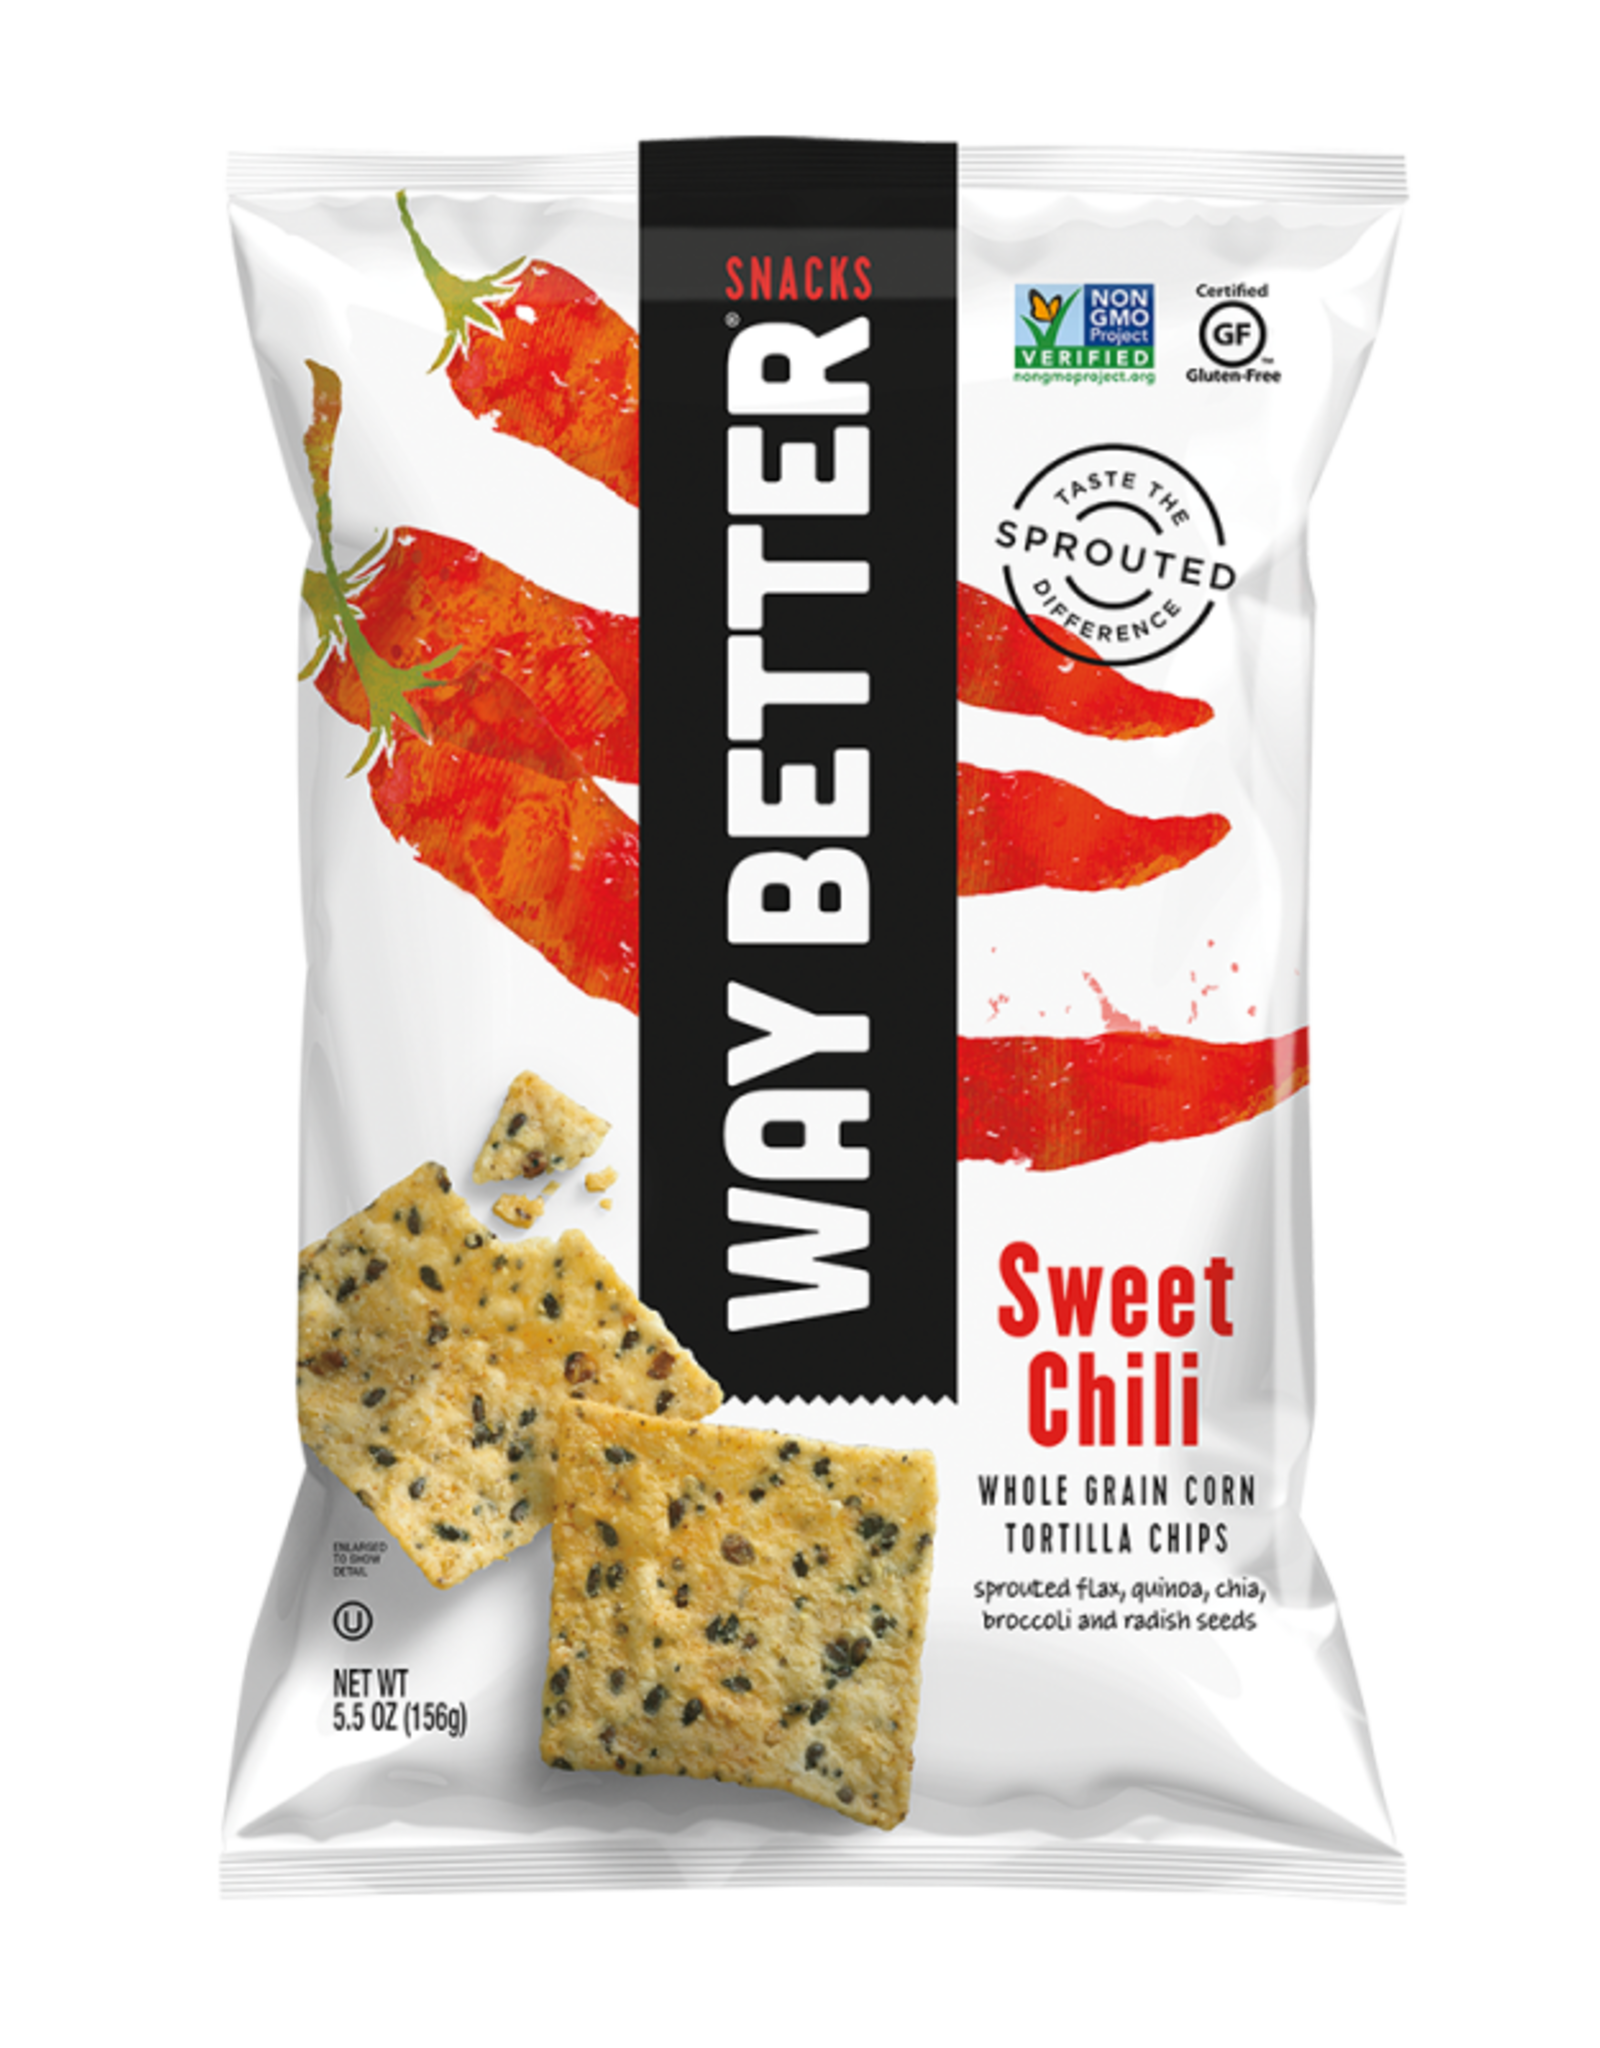 Way Better Way Better - Tortilla Chips, Sweet Chili (156g)